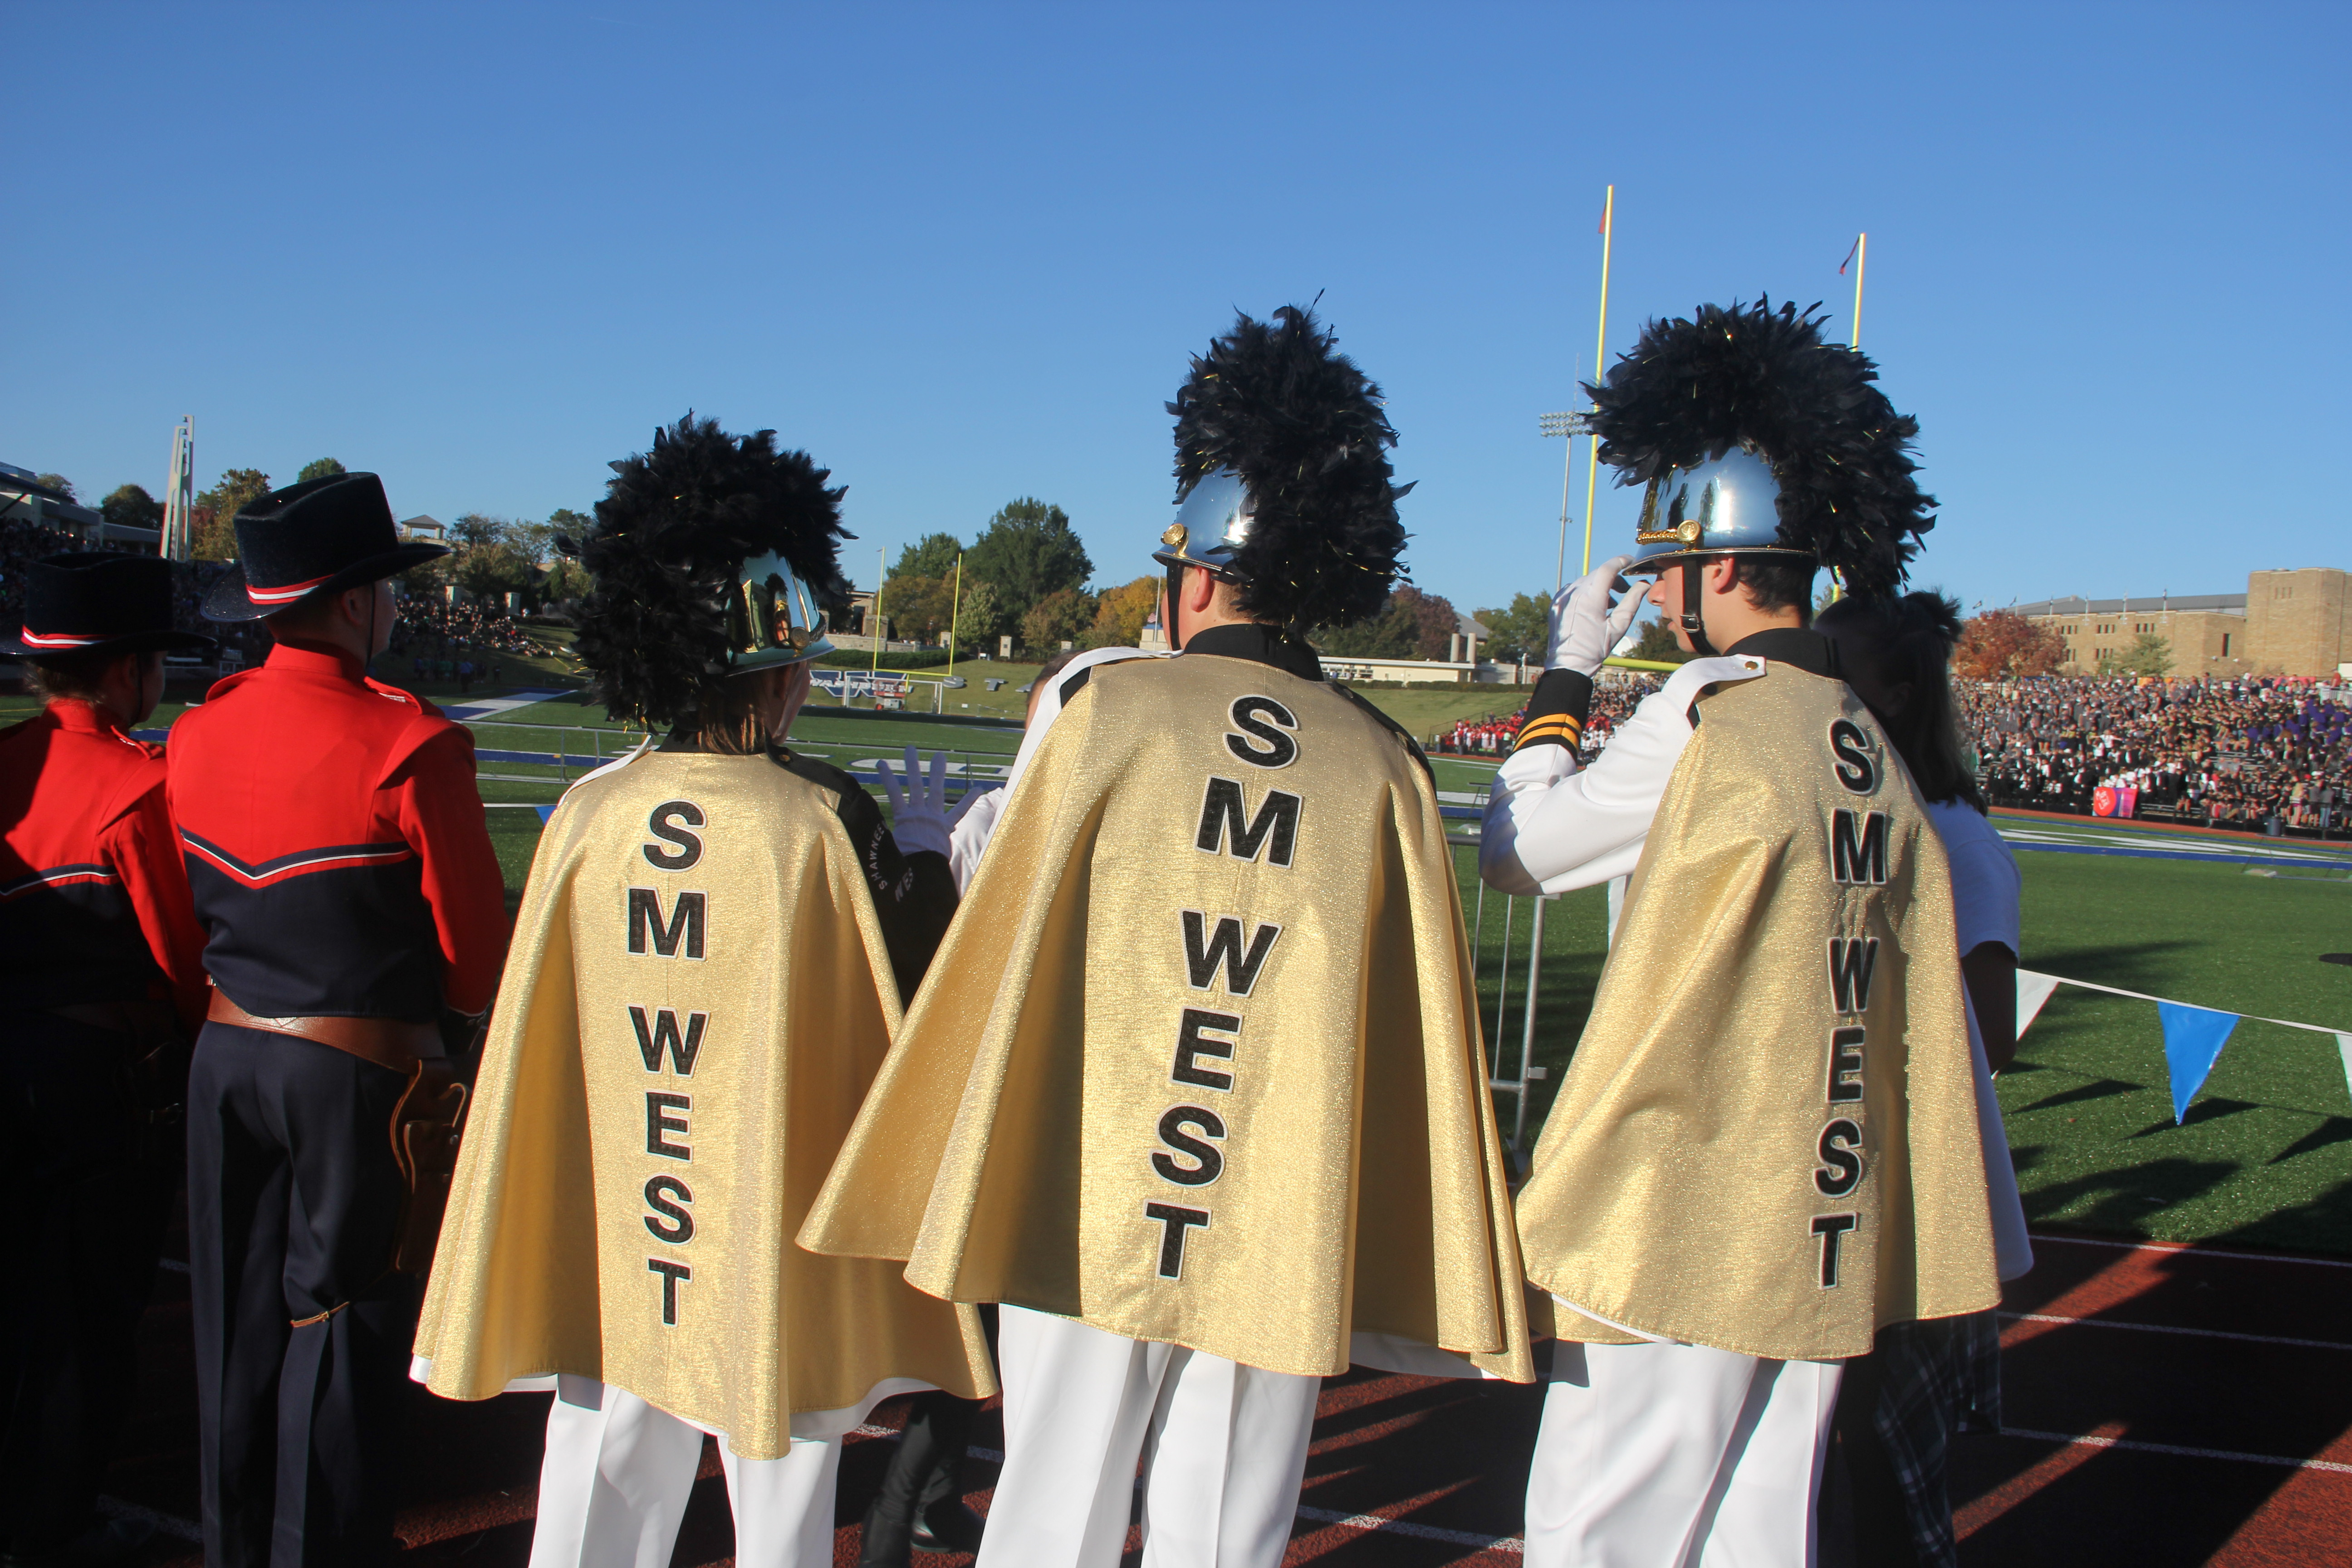 SM West Drum Majors at Kansas Bandmasters Association